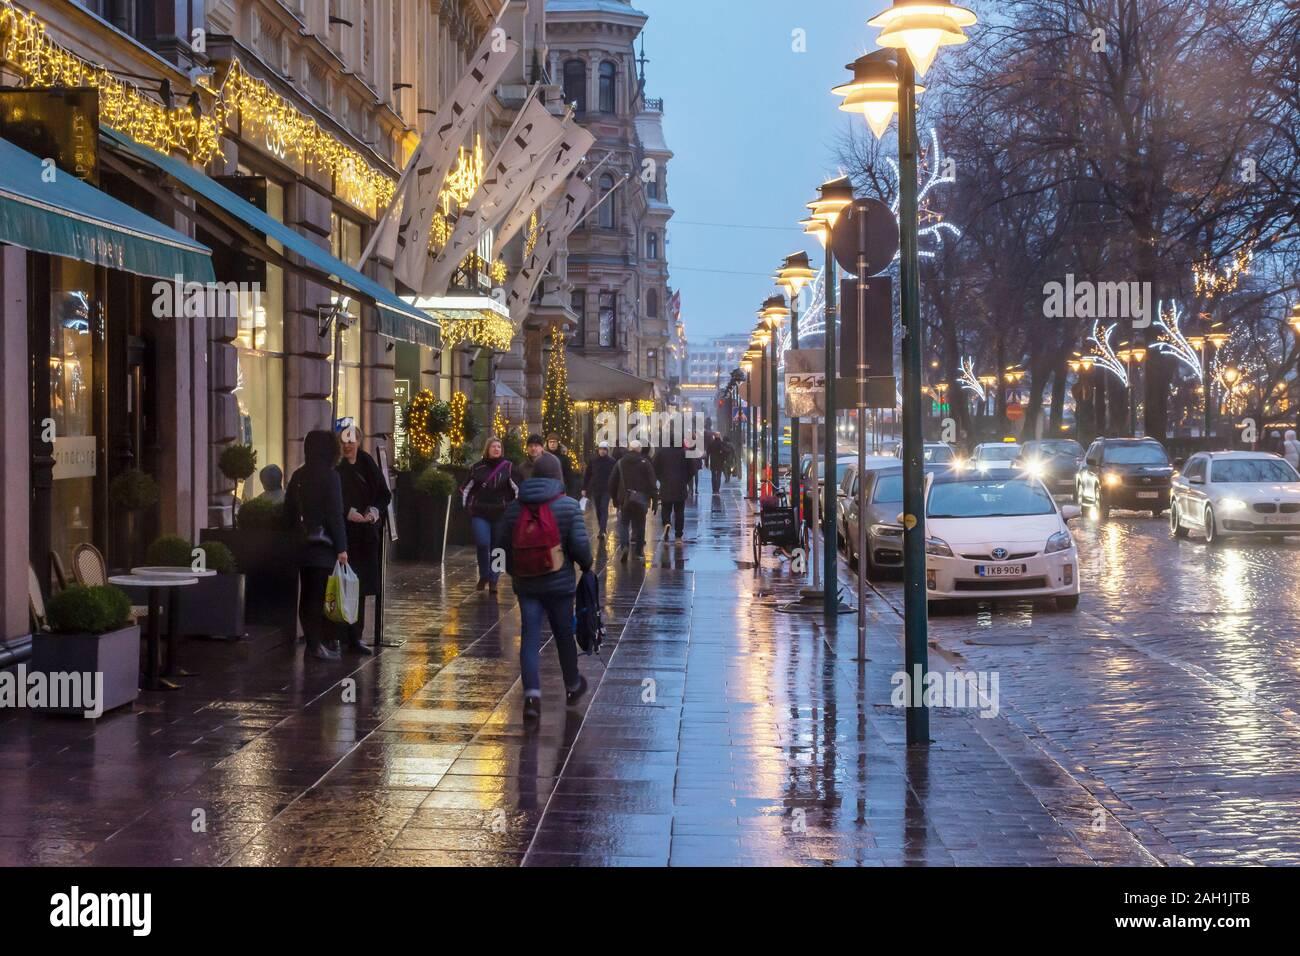 Pohjois-Esplanadi Street in Christmas Decoration in Helsinki Finland Stock Photo